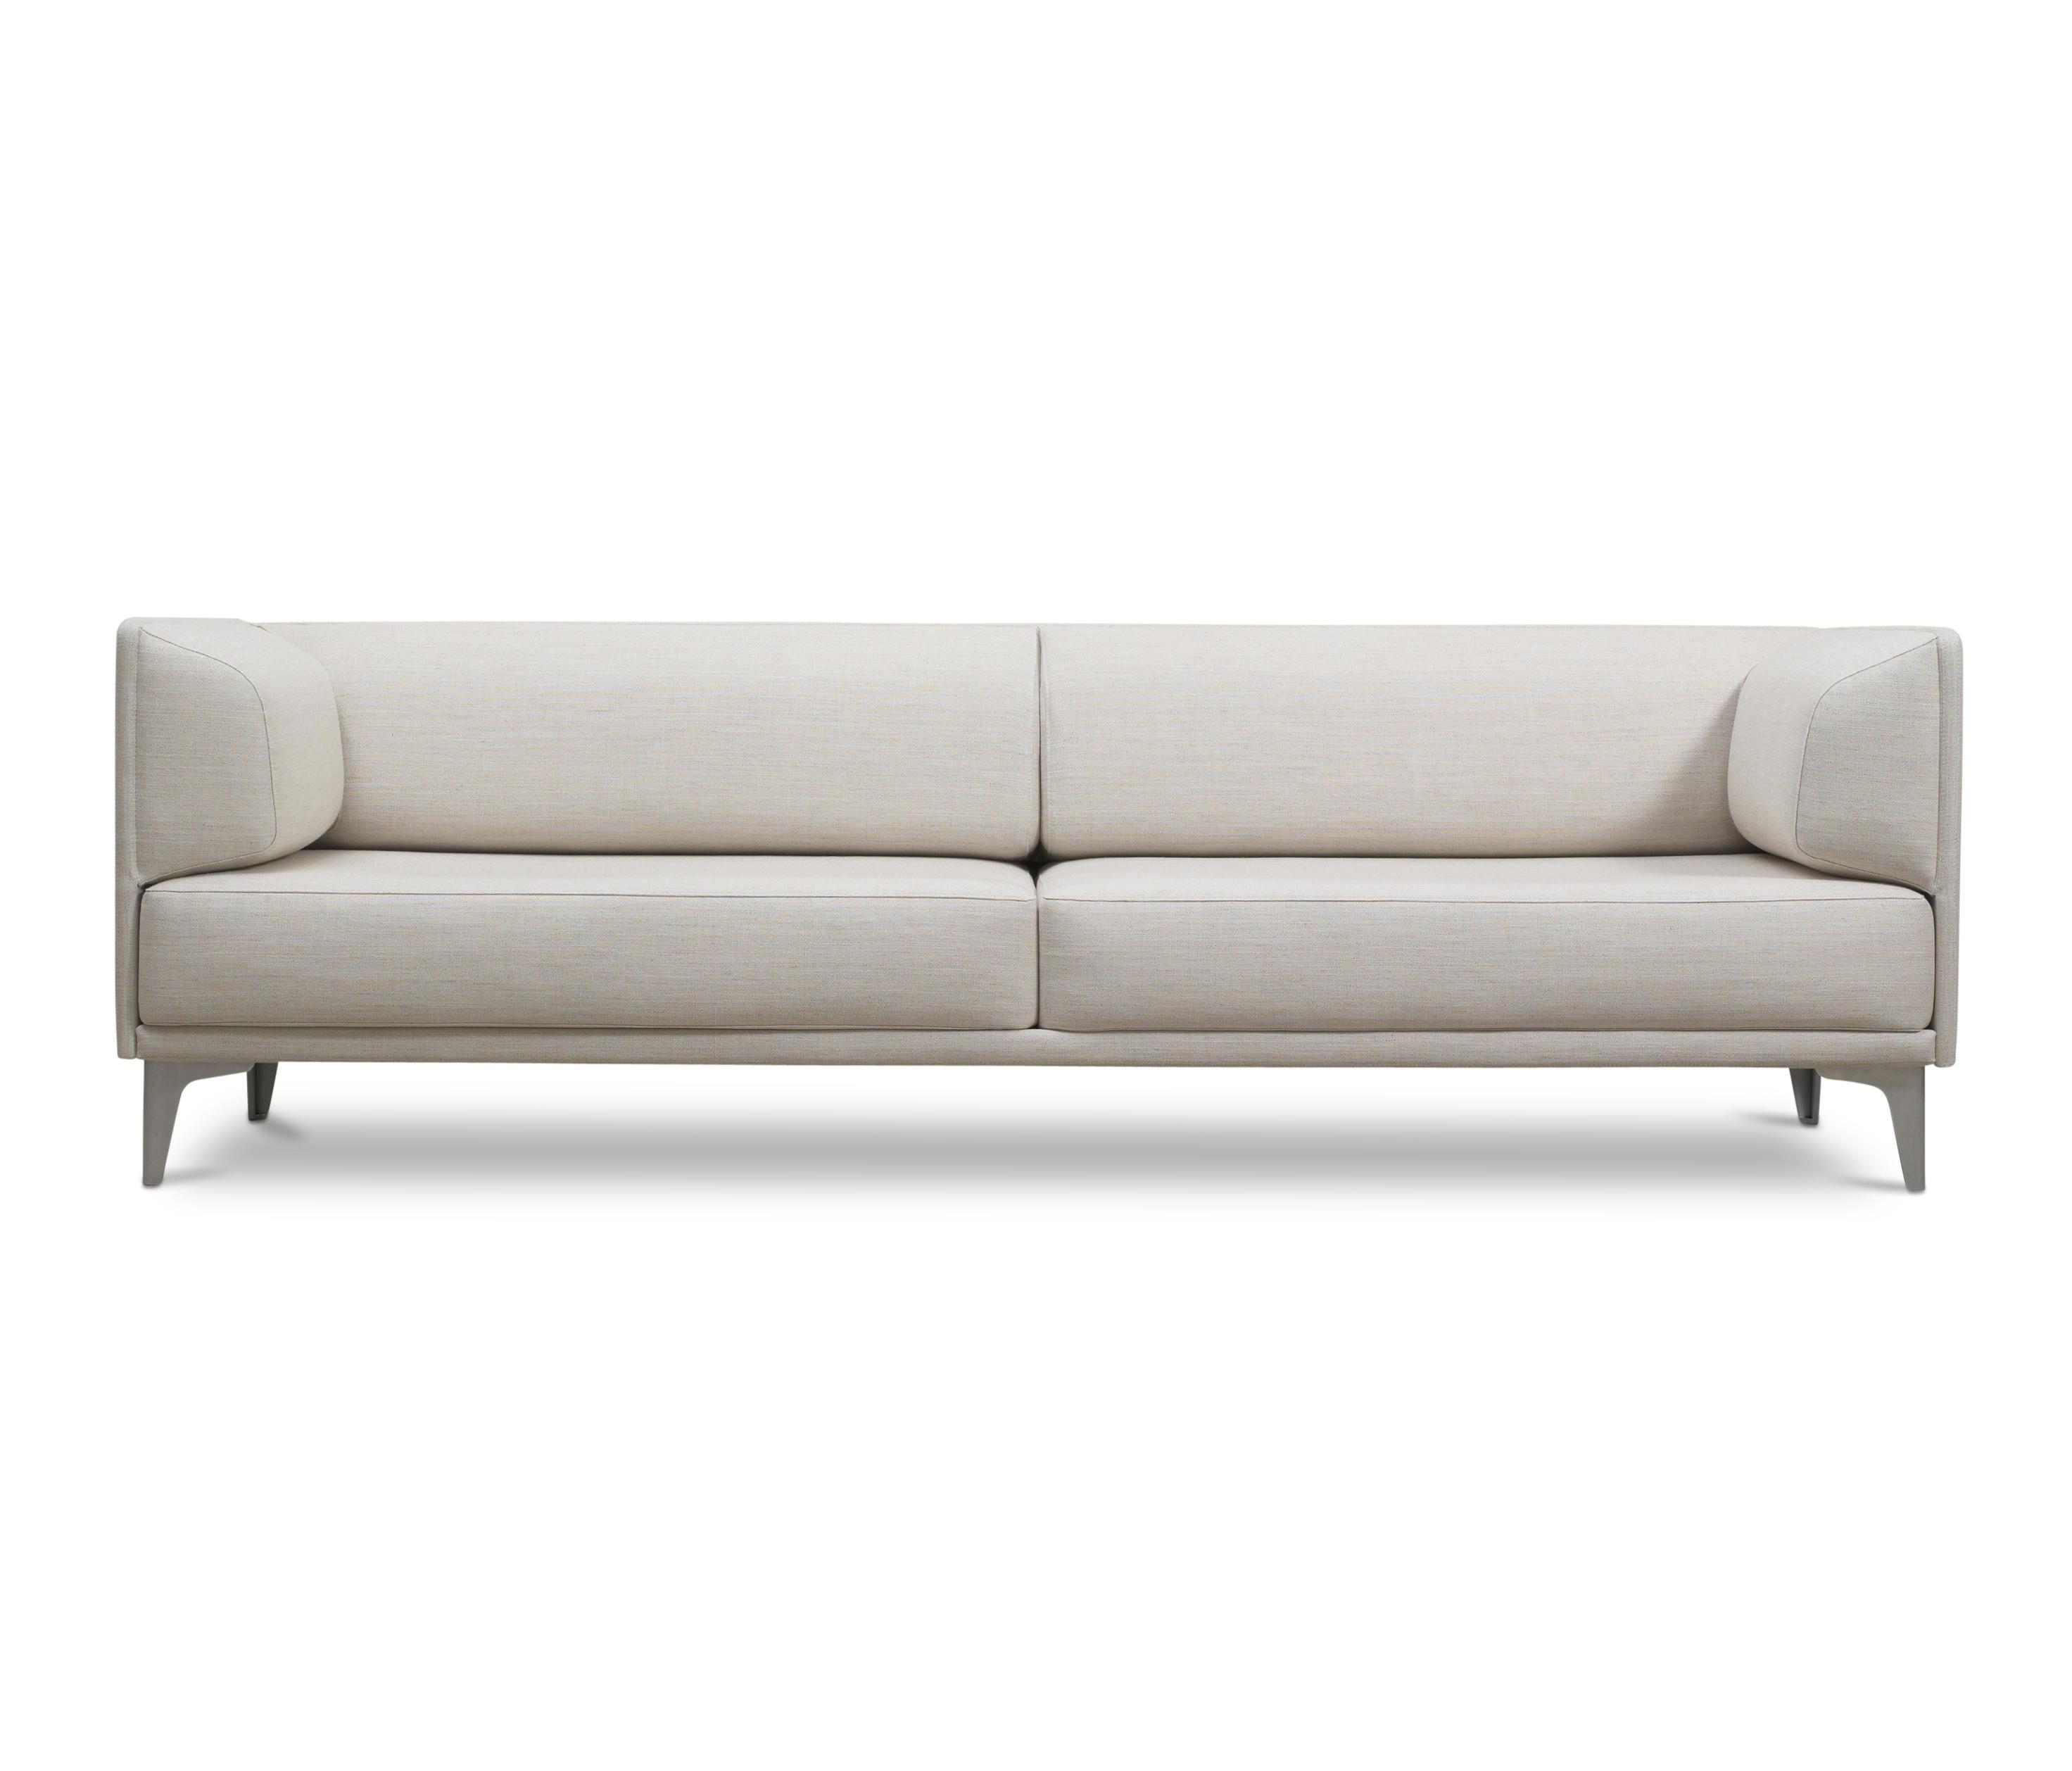 erik jorgensen sofa contemporary sofa leather chromed metal fabric ej 220 270 thesofa. Black Bedroom Furniture Sets. Home Design Ideas